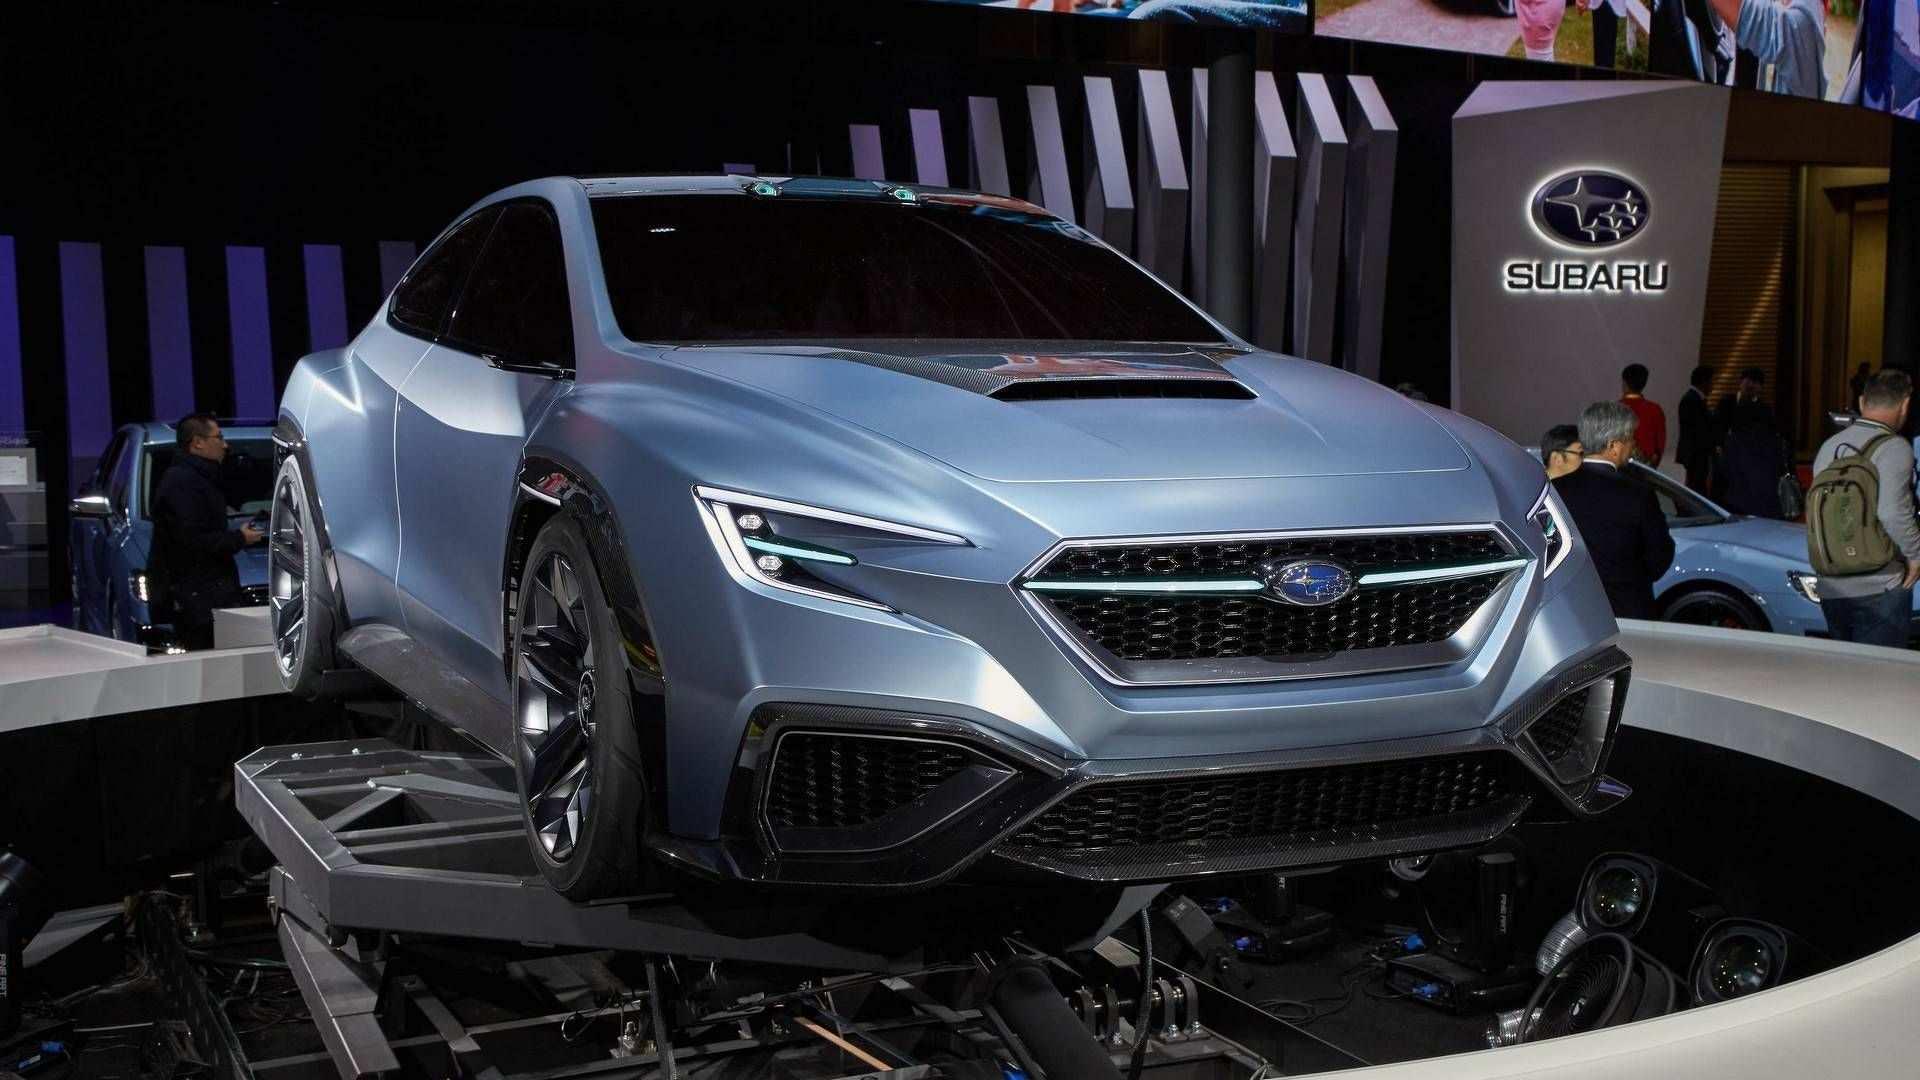 85 Great Next Generation Subaru Forester 2020 Specs and Review by Next Generation Subaru Forester 2020